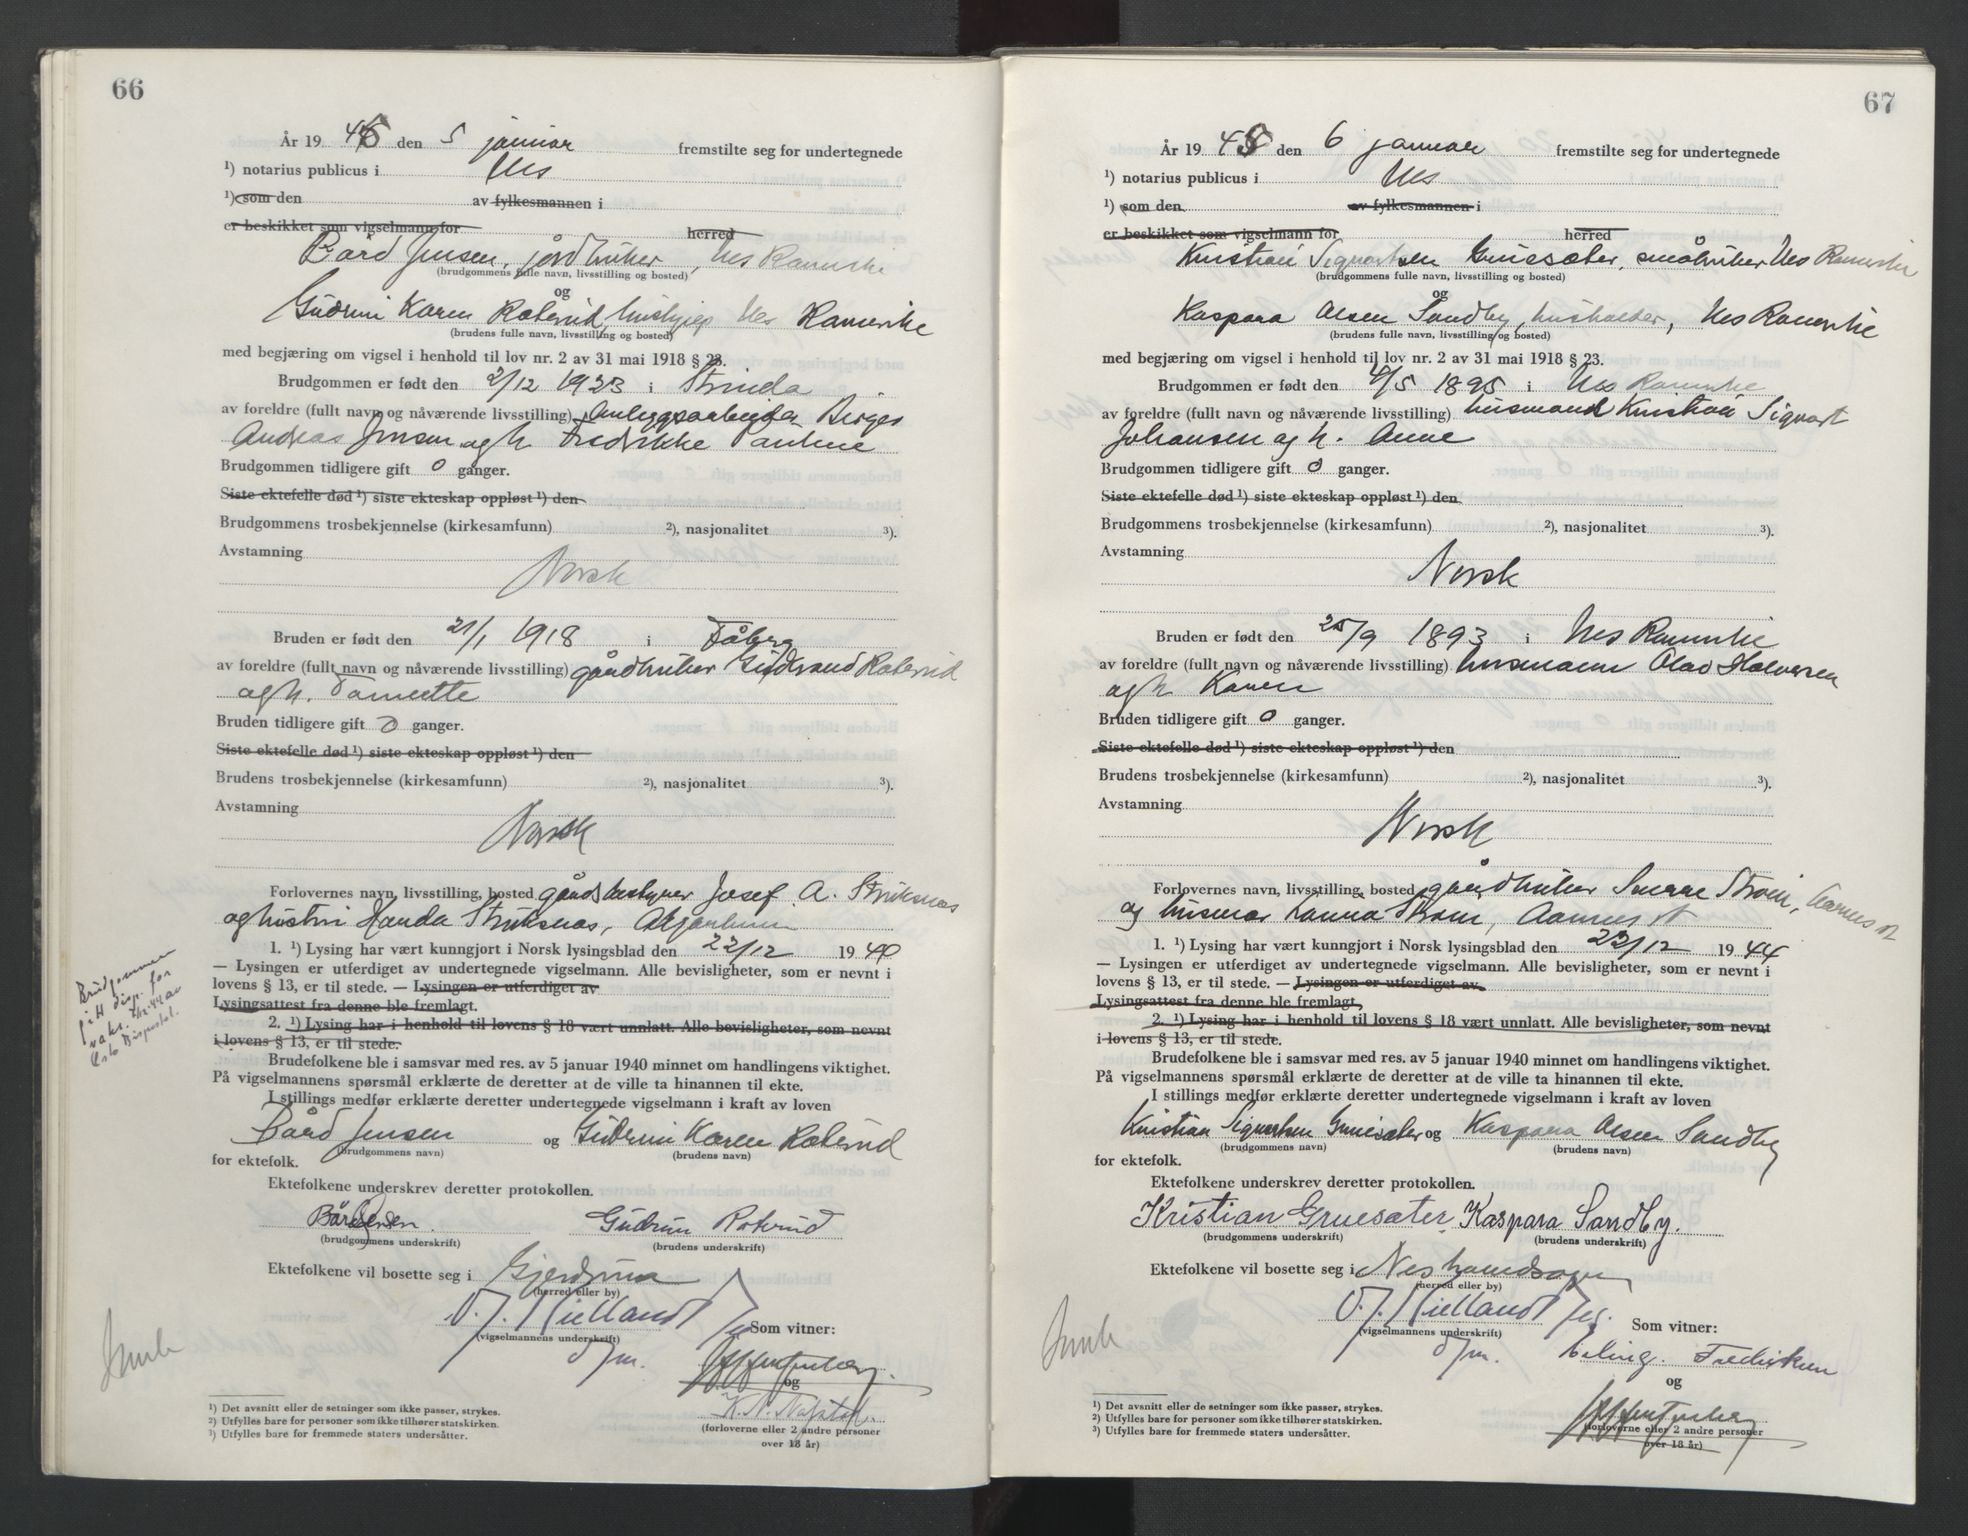 SAO, Nes tingrett, L/Lc/Lca/L0003: Vigselbok, 1944-1953, s. 66-67